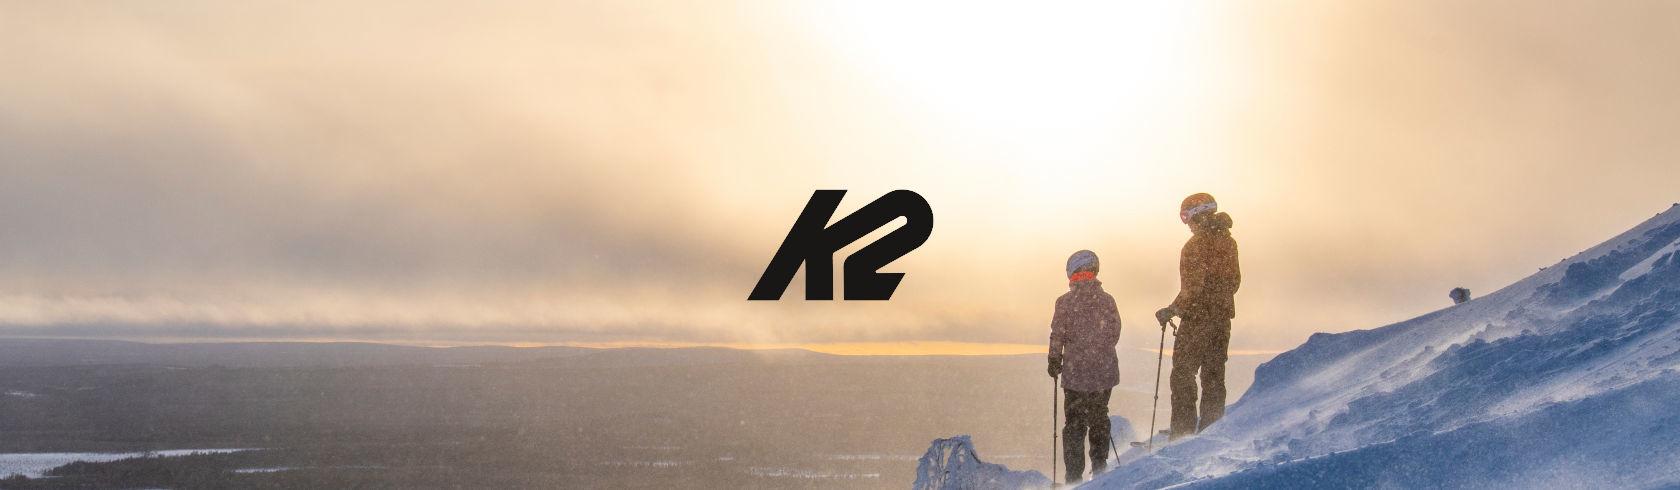 K2 skis & snowboards brand logo